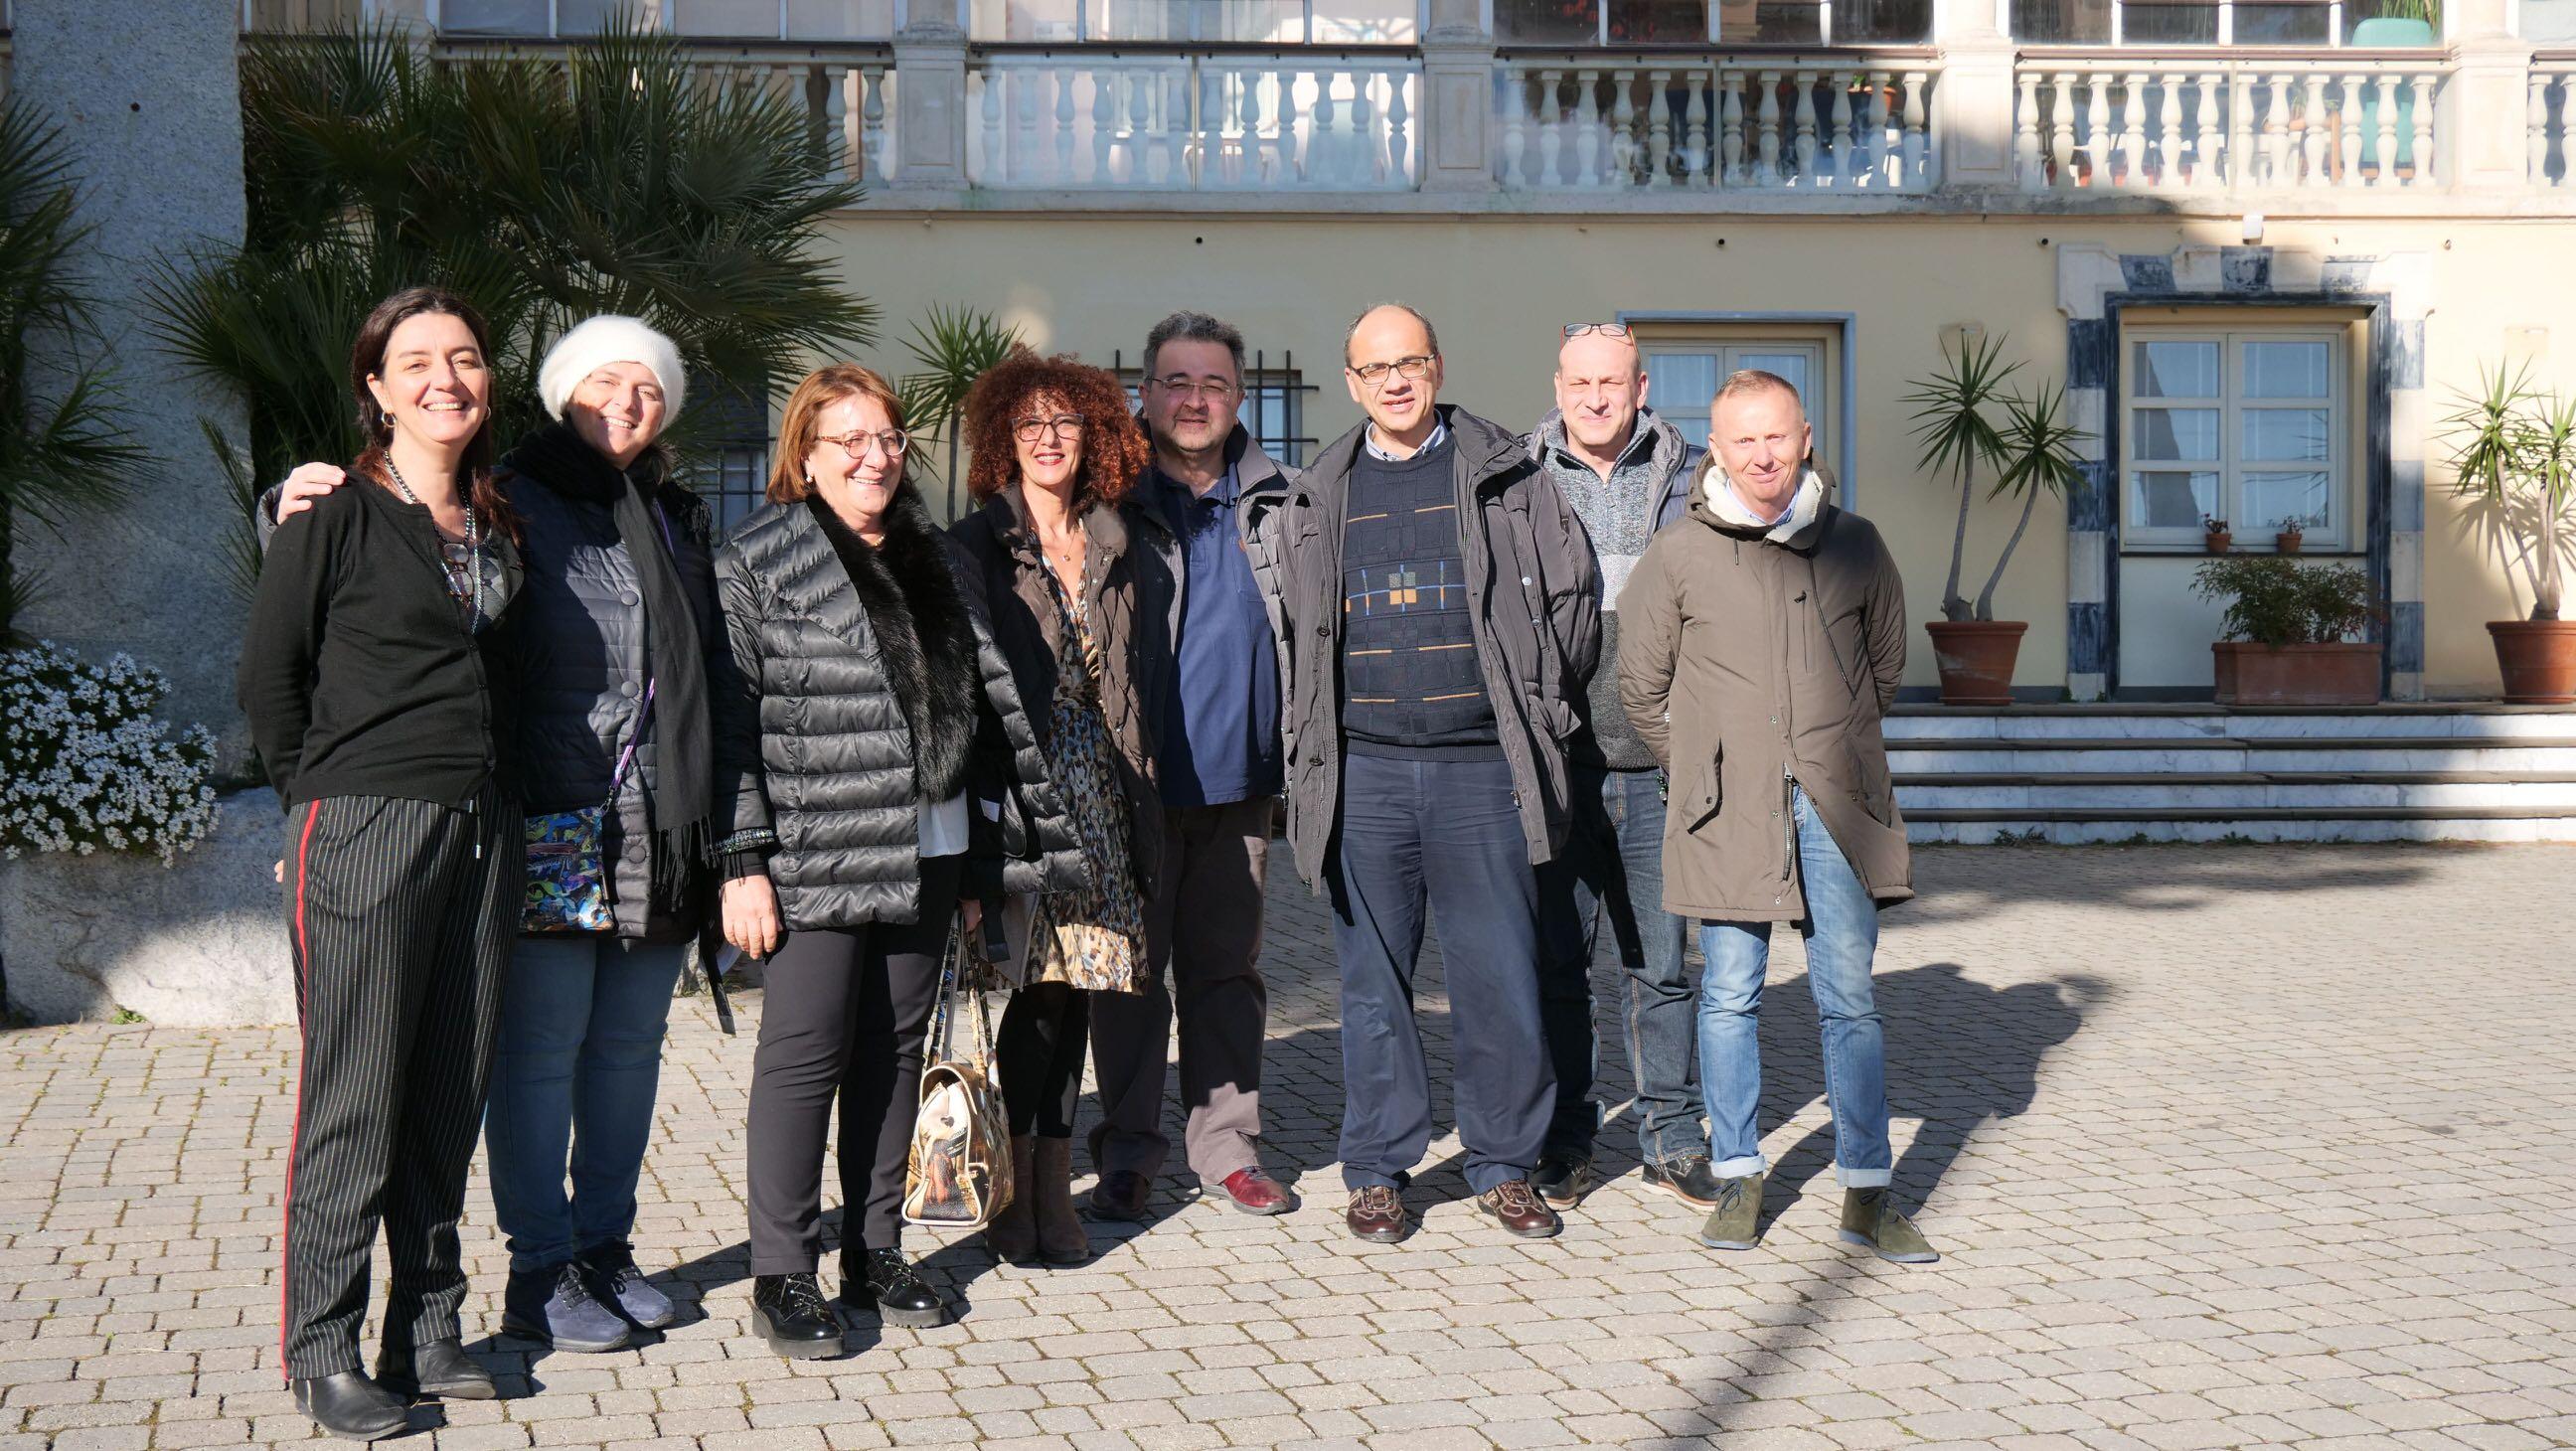 Visita responsabili don Orione Pescara 2019.01.24 - 2